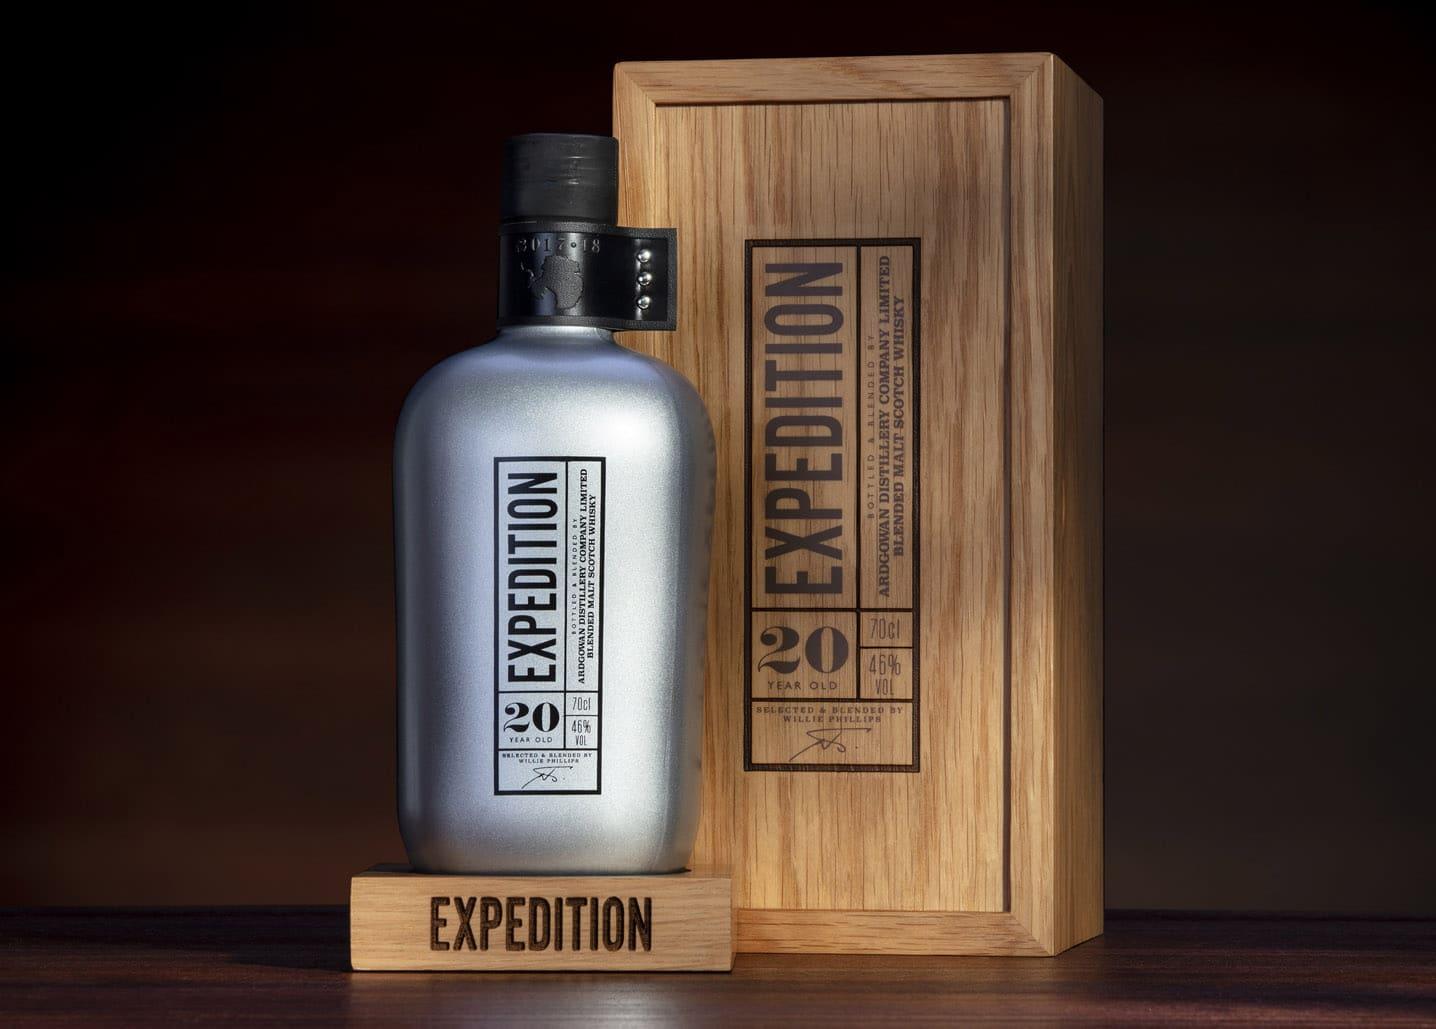 Ardgowan Expedition - Todo Whisky